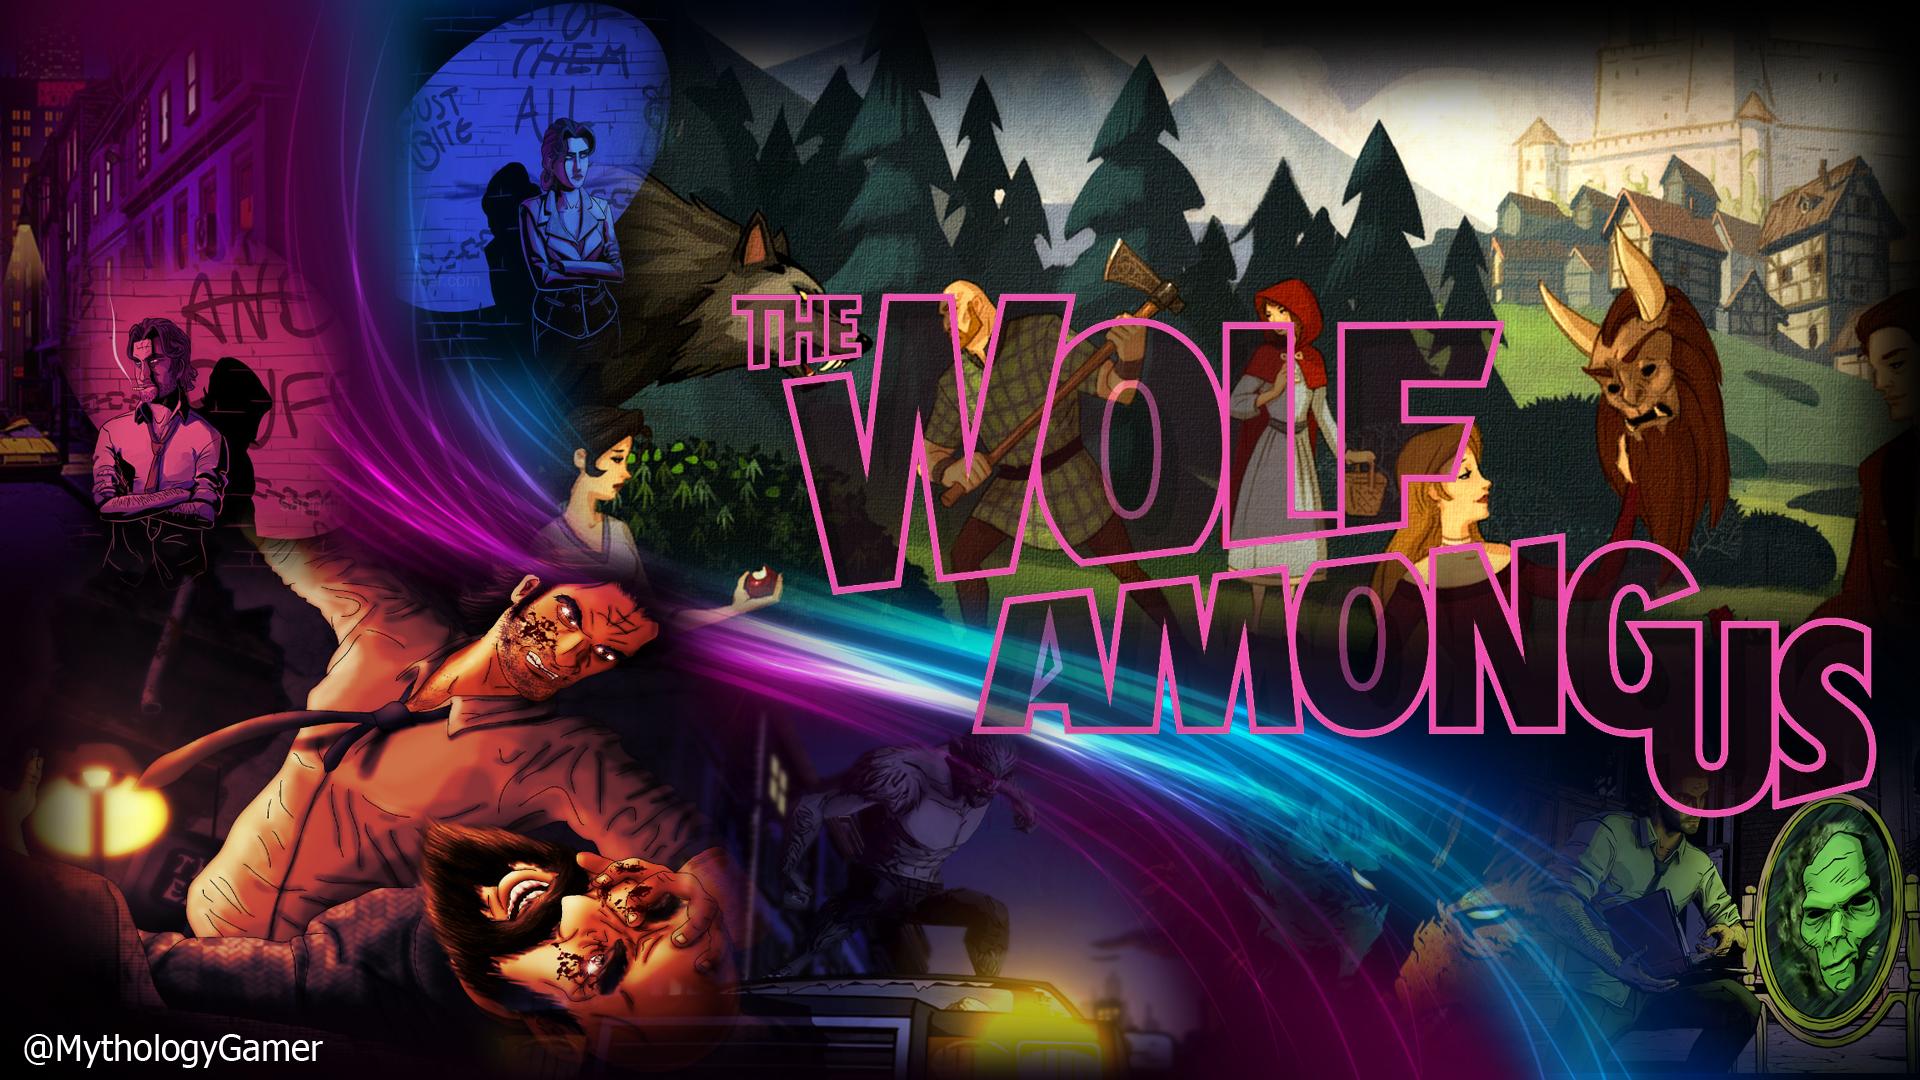 The Wolf Among Wallpapers Mythology Gaming 1920x1080